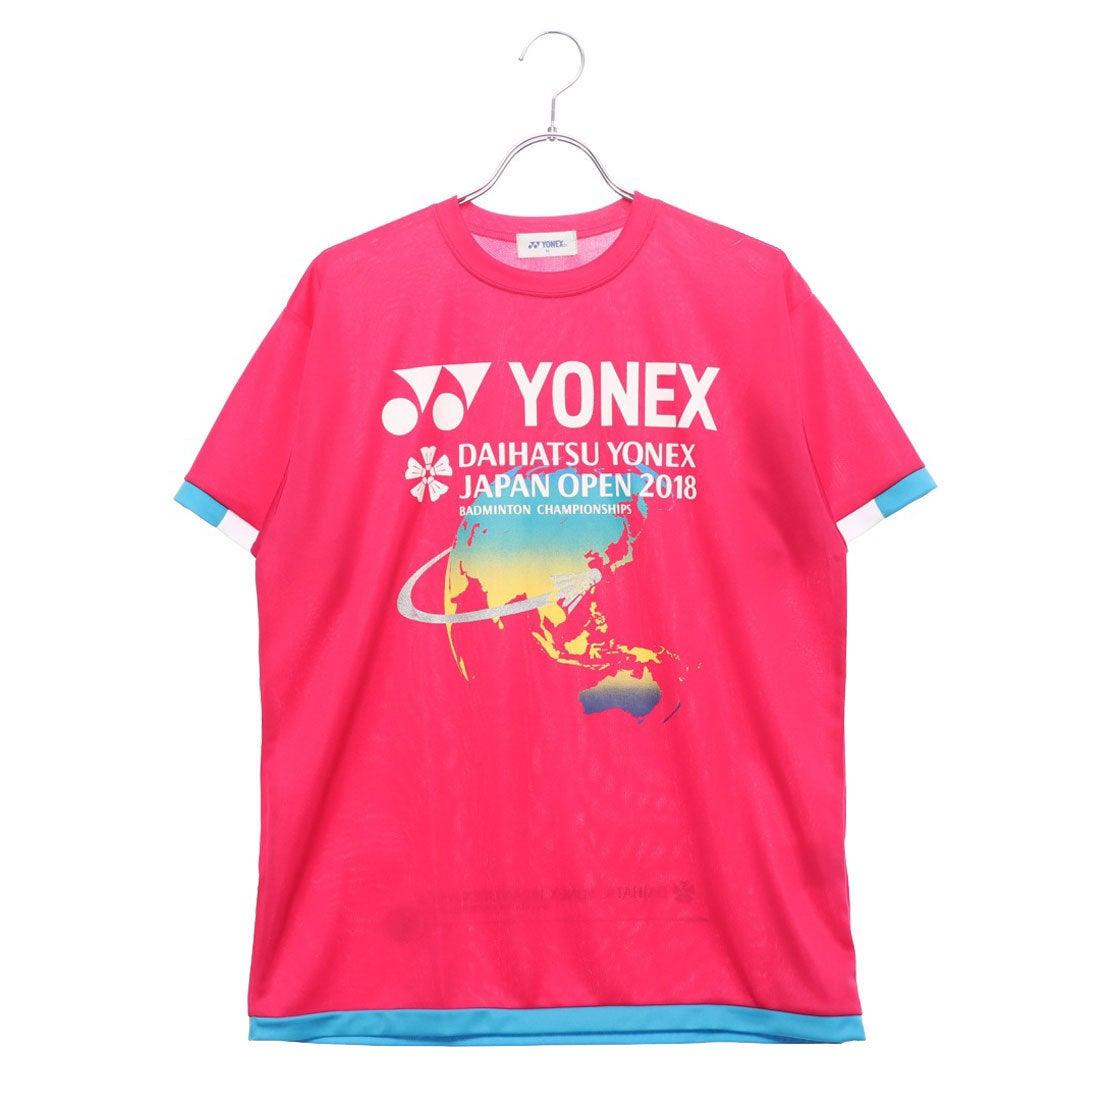 c64090d5de0a5 ヨネックス YONEX バドミントン 半袖Tシャツ ユニプラクティスTシャツ YOB18330 -レディースファッション通販  ロコンドガールズコレクション (LOCONDO GIRL'S ...